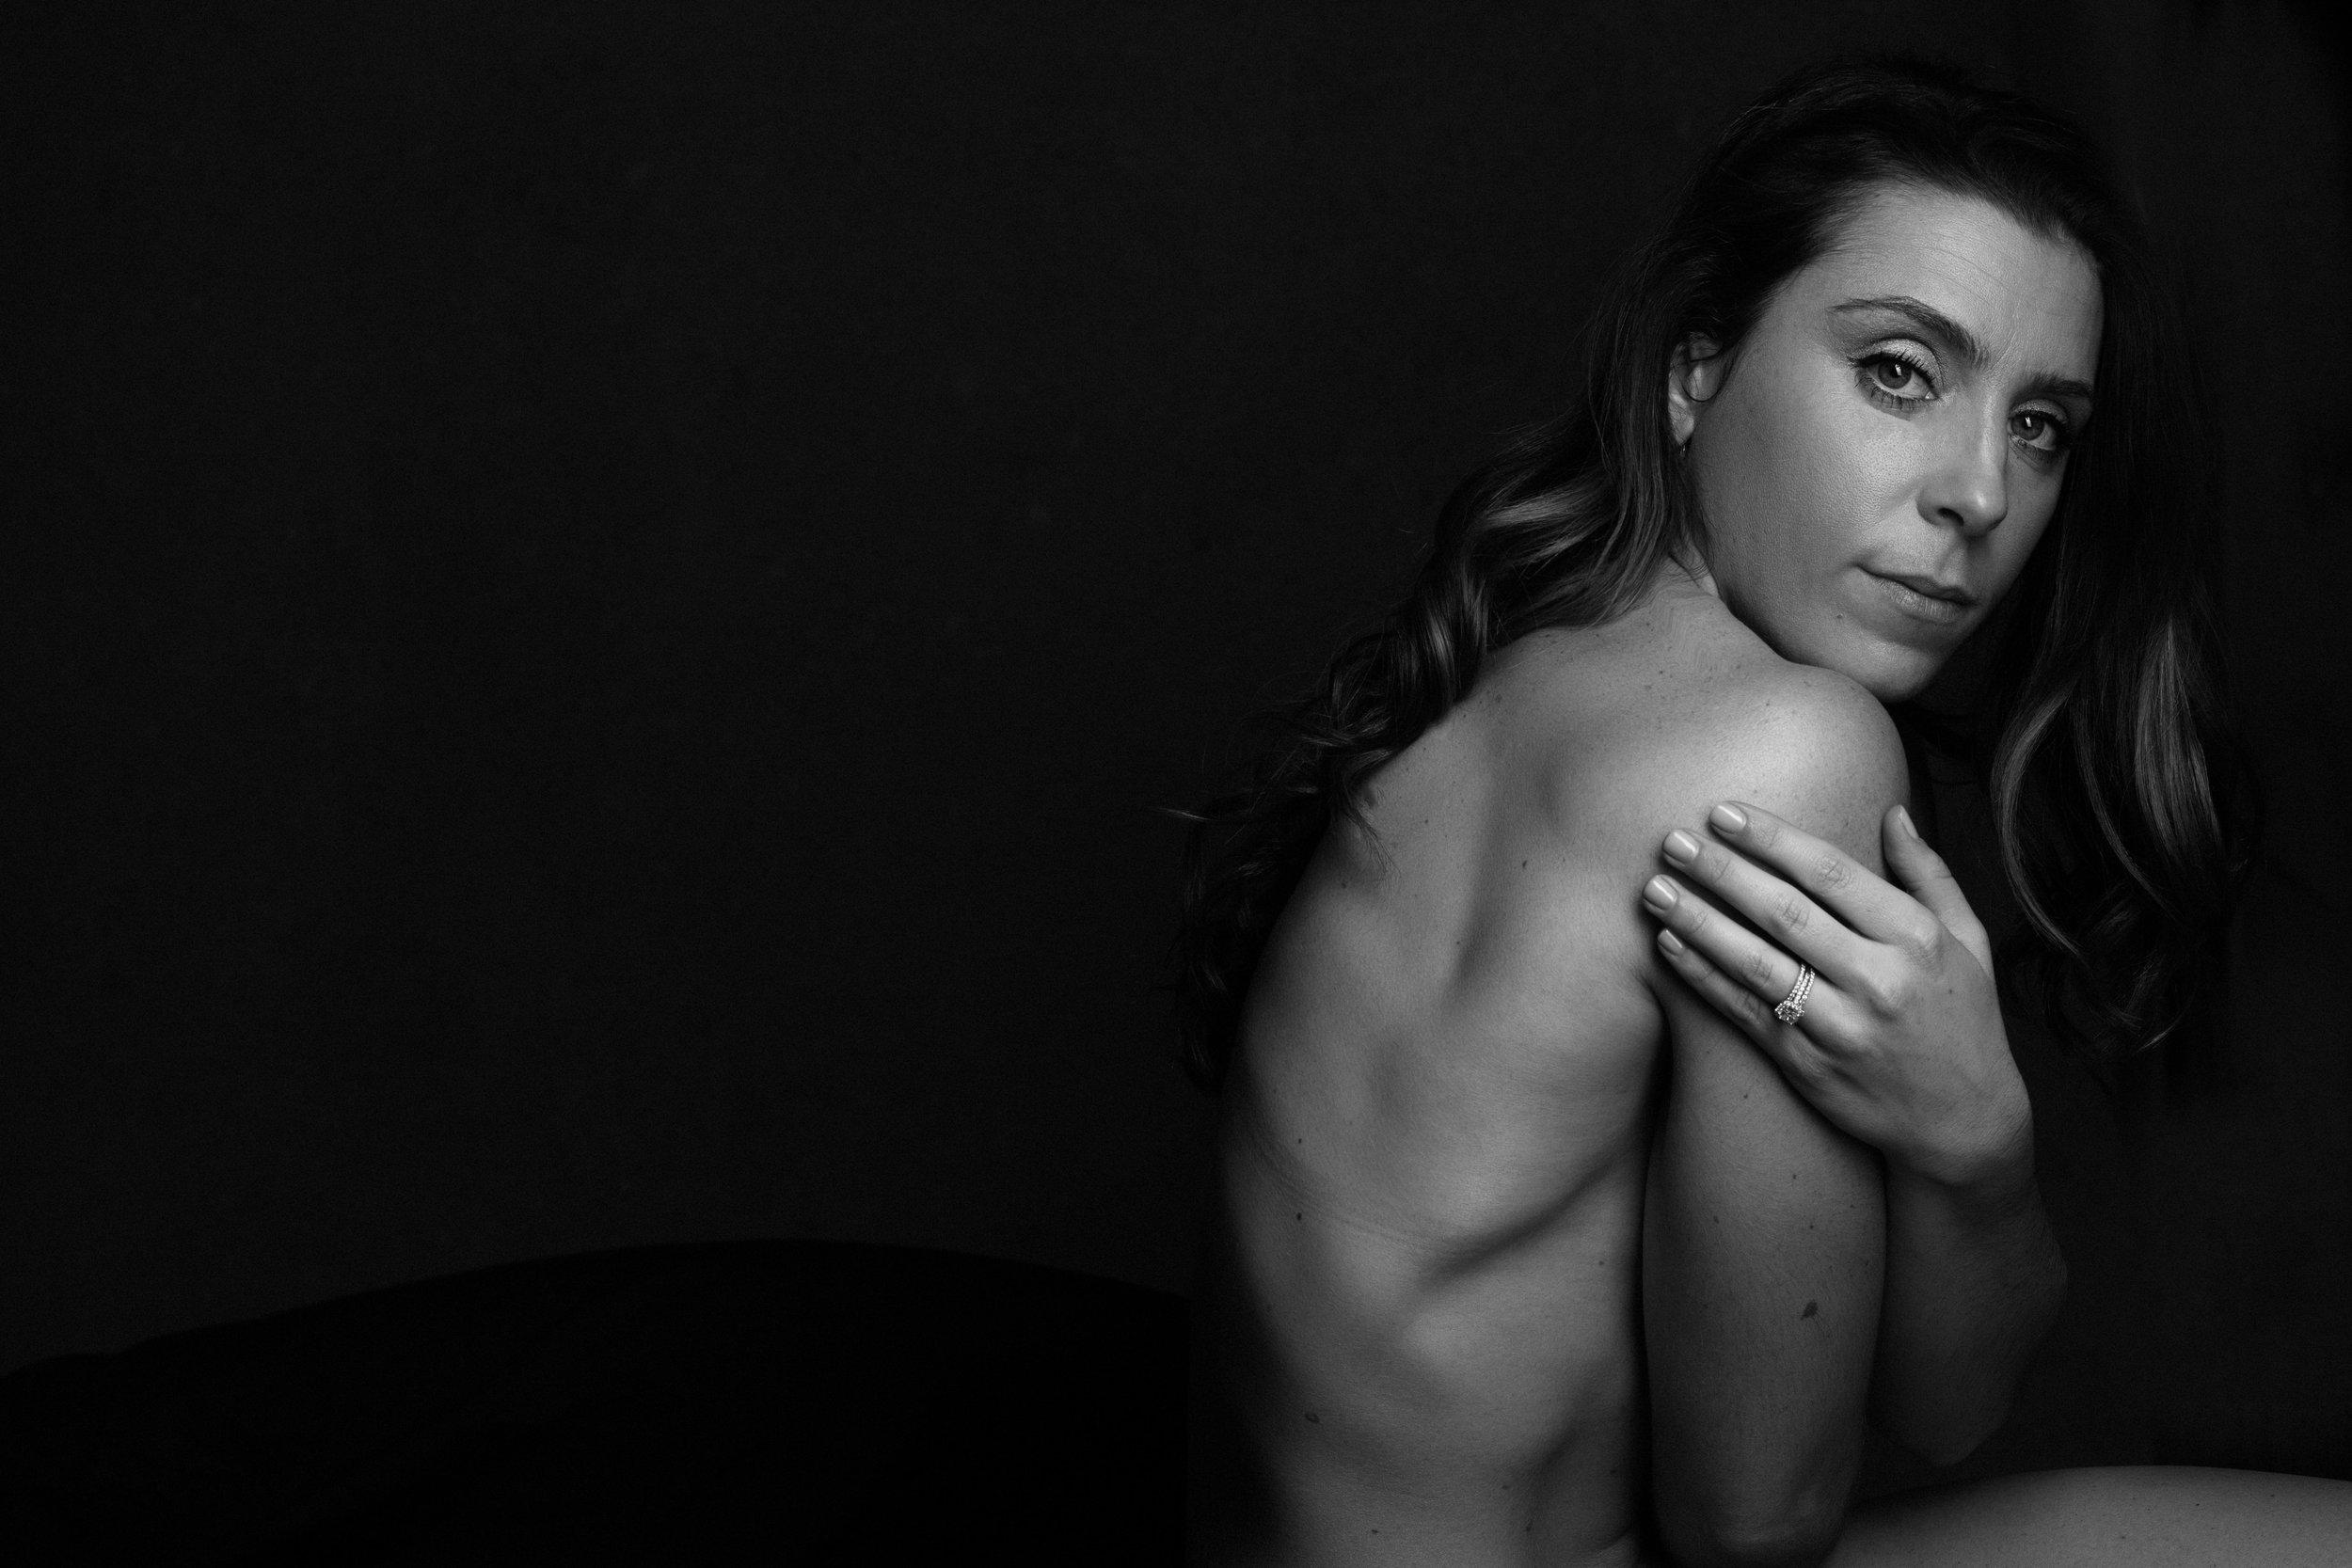 Fine-Art-nude-photography.jpg